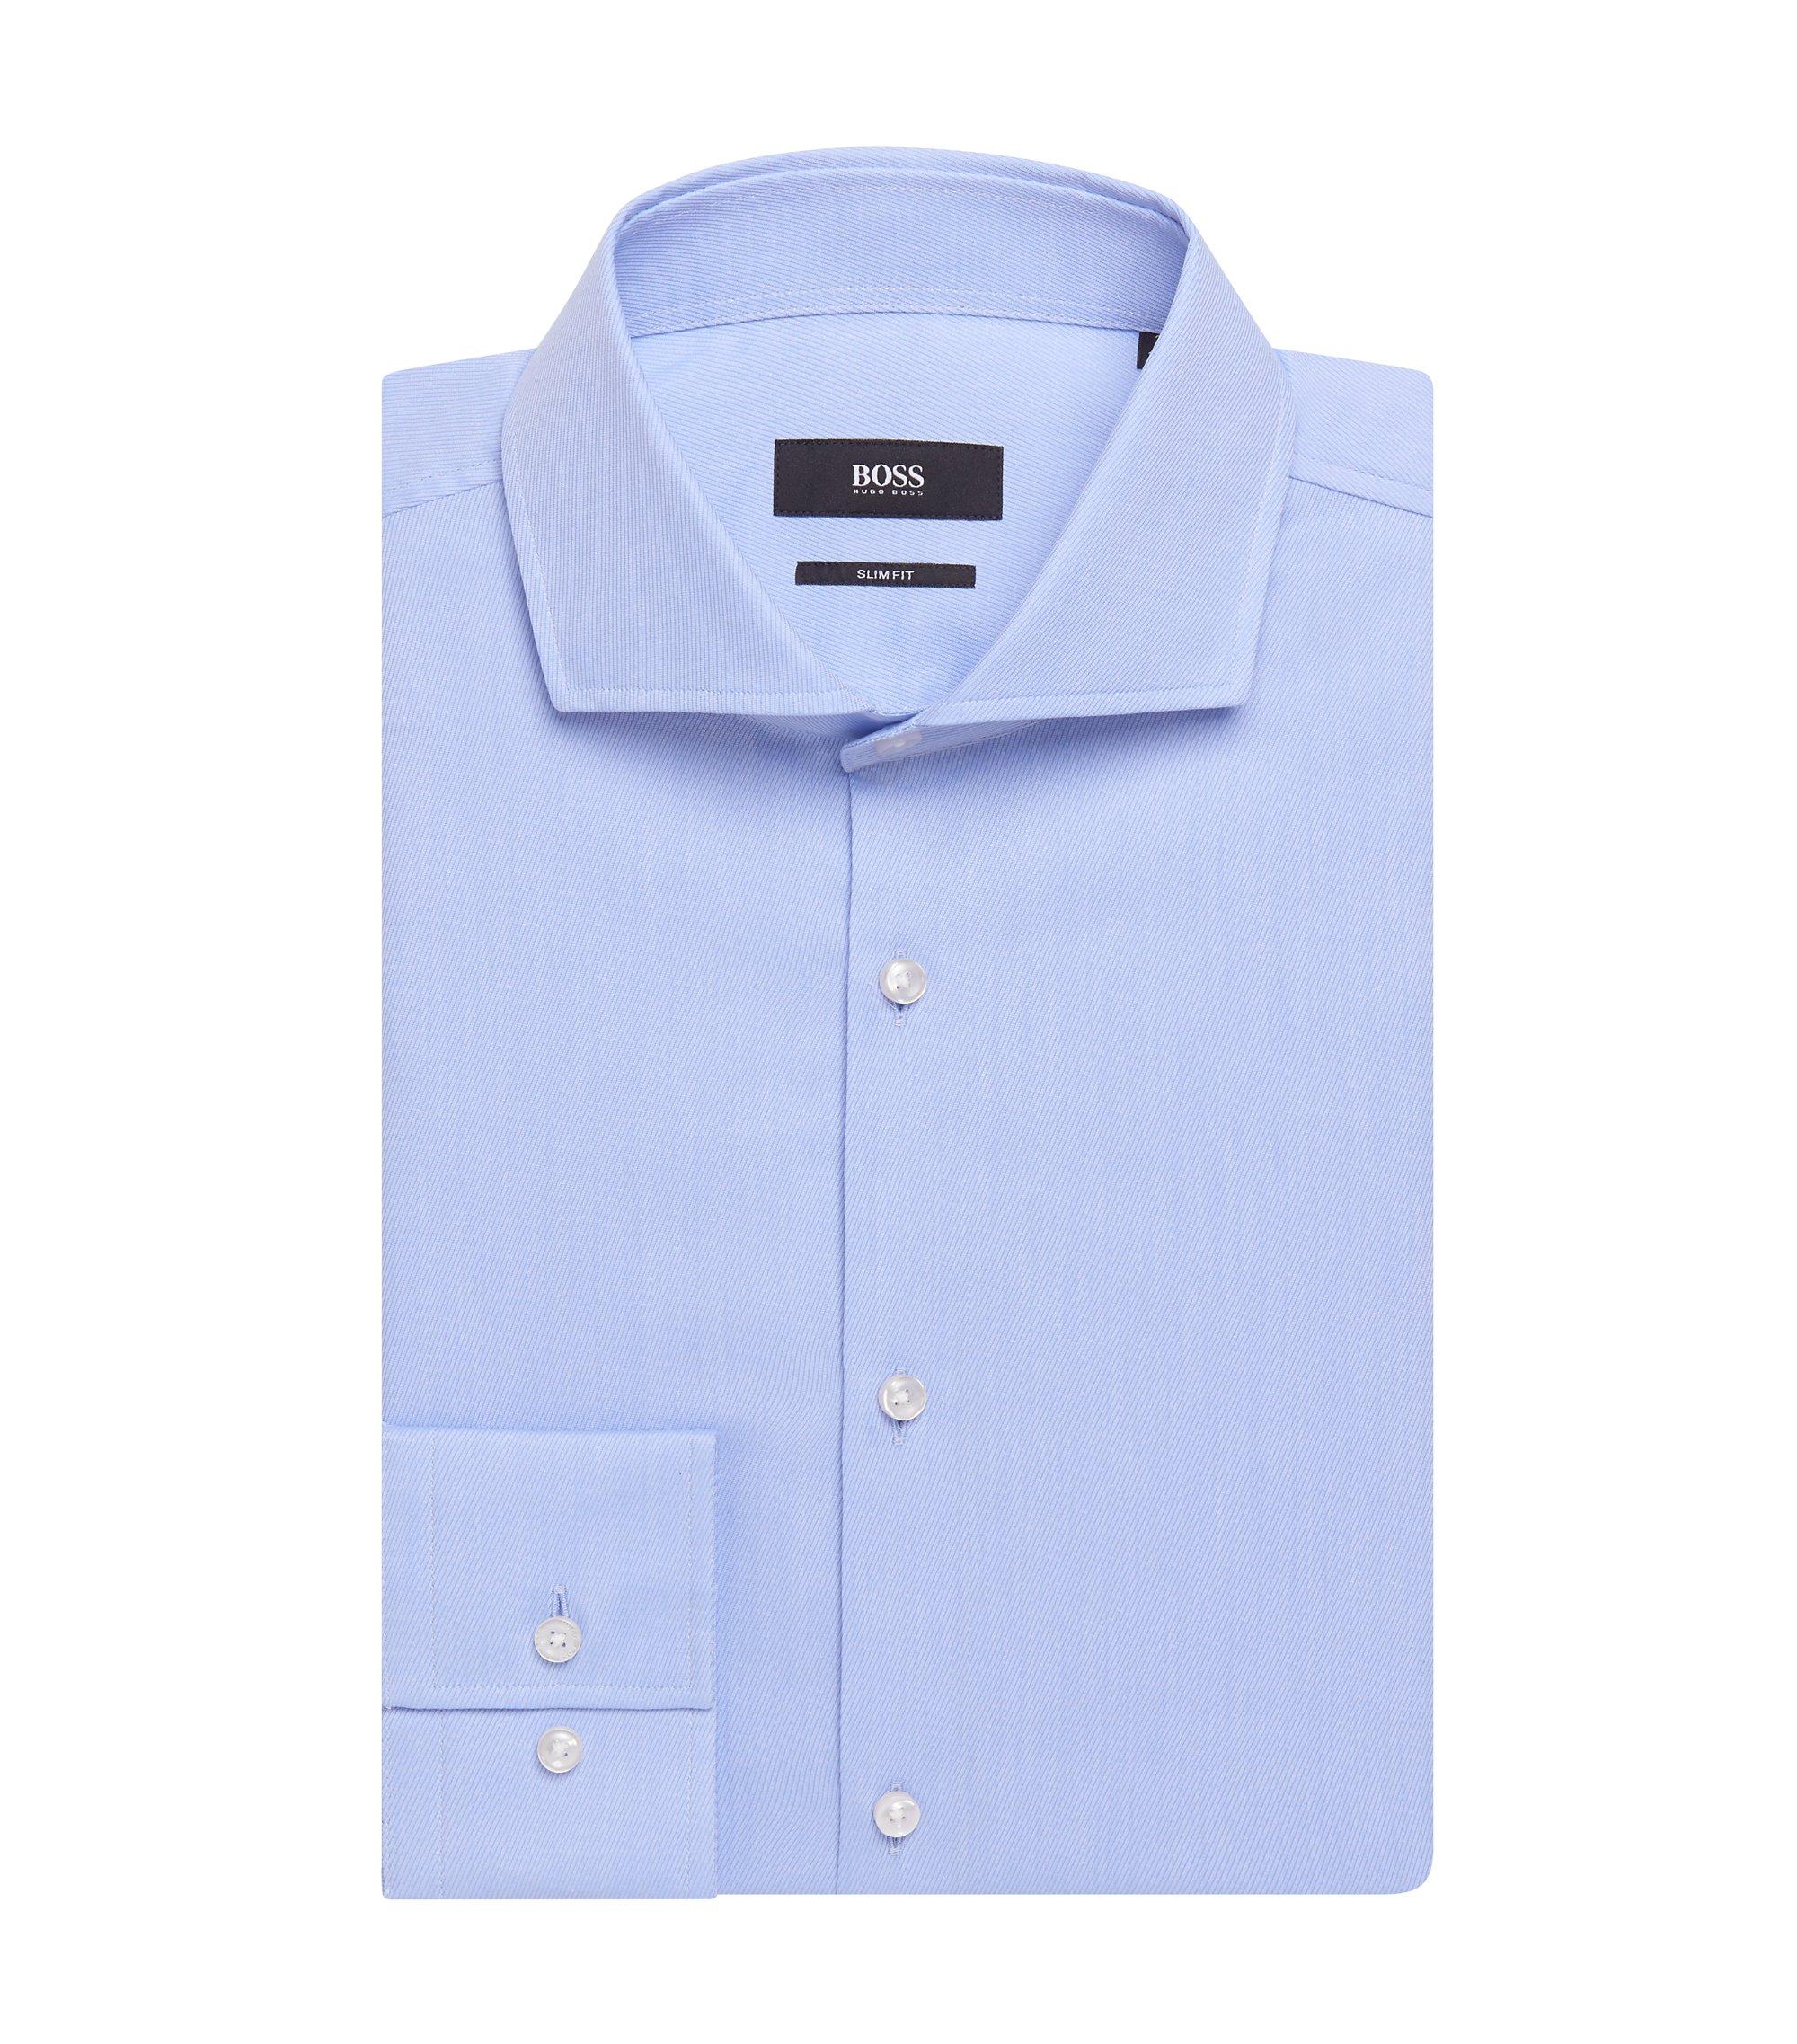 Traveler Cotton Dress Shirt with Stretch Tailoring, Slim Fit | Jason, Light Blue